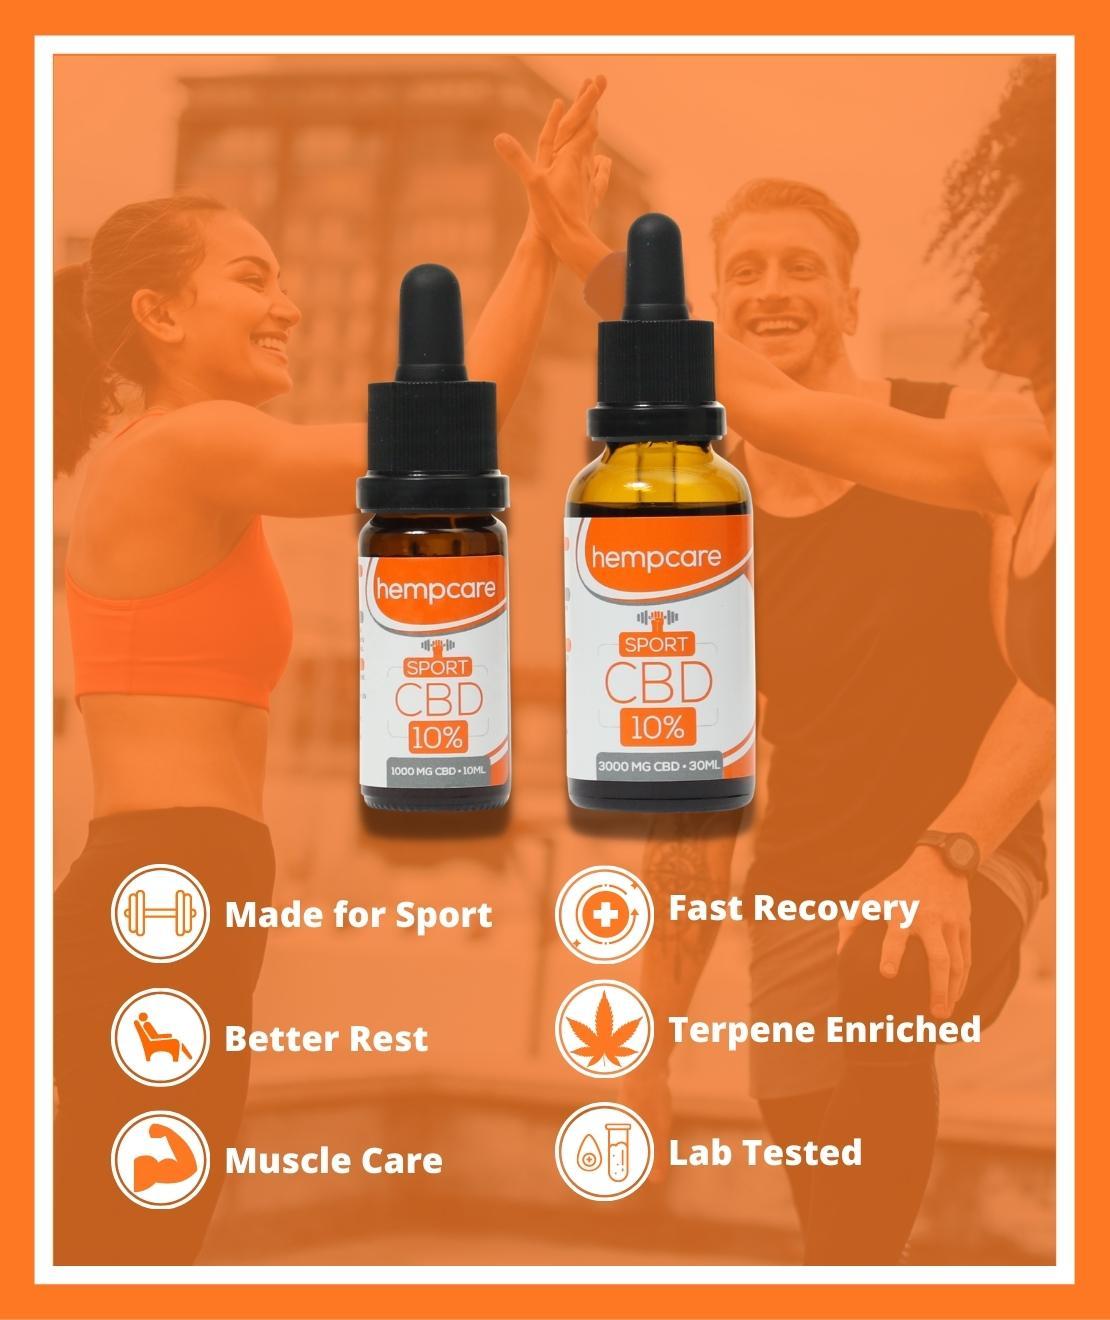 Hempcare Sport CBD Oil